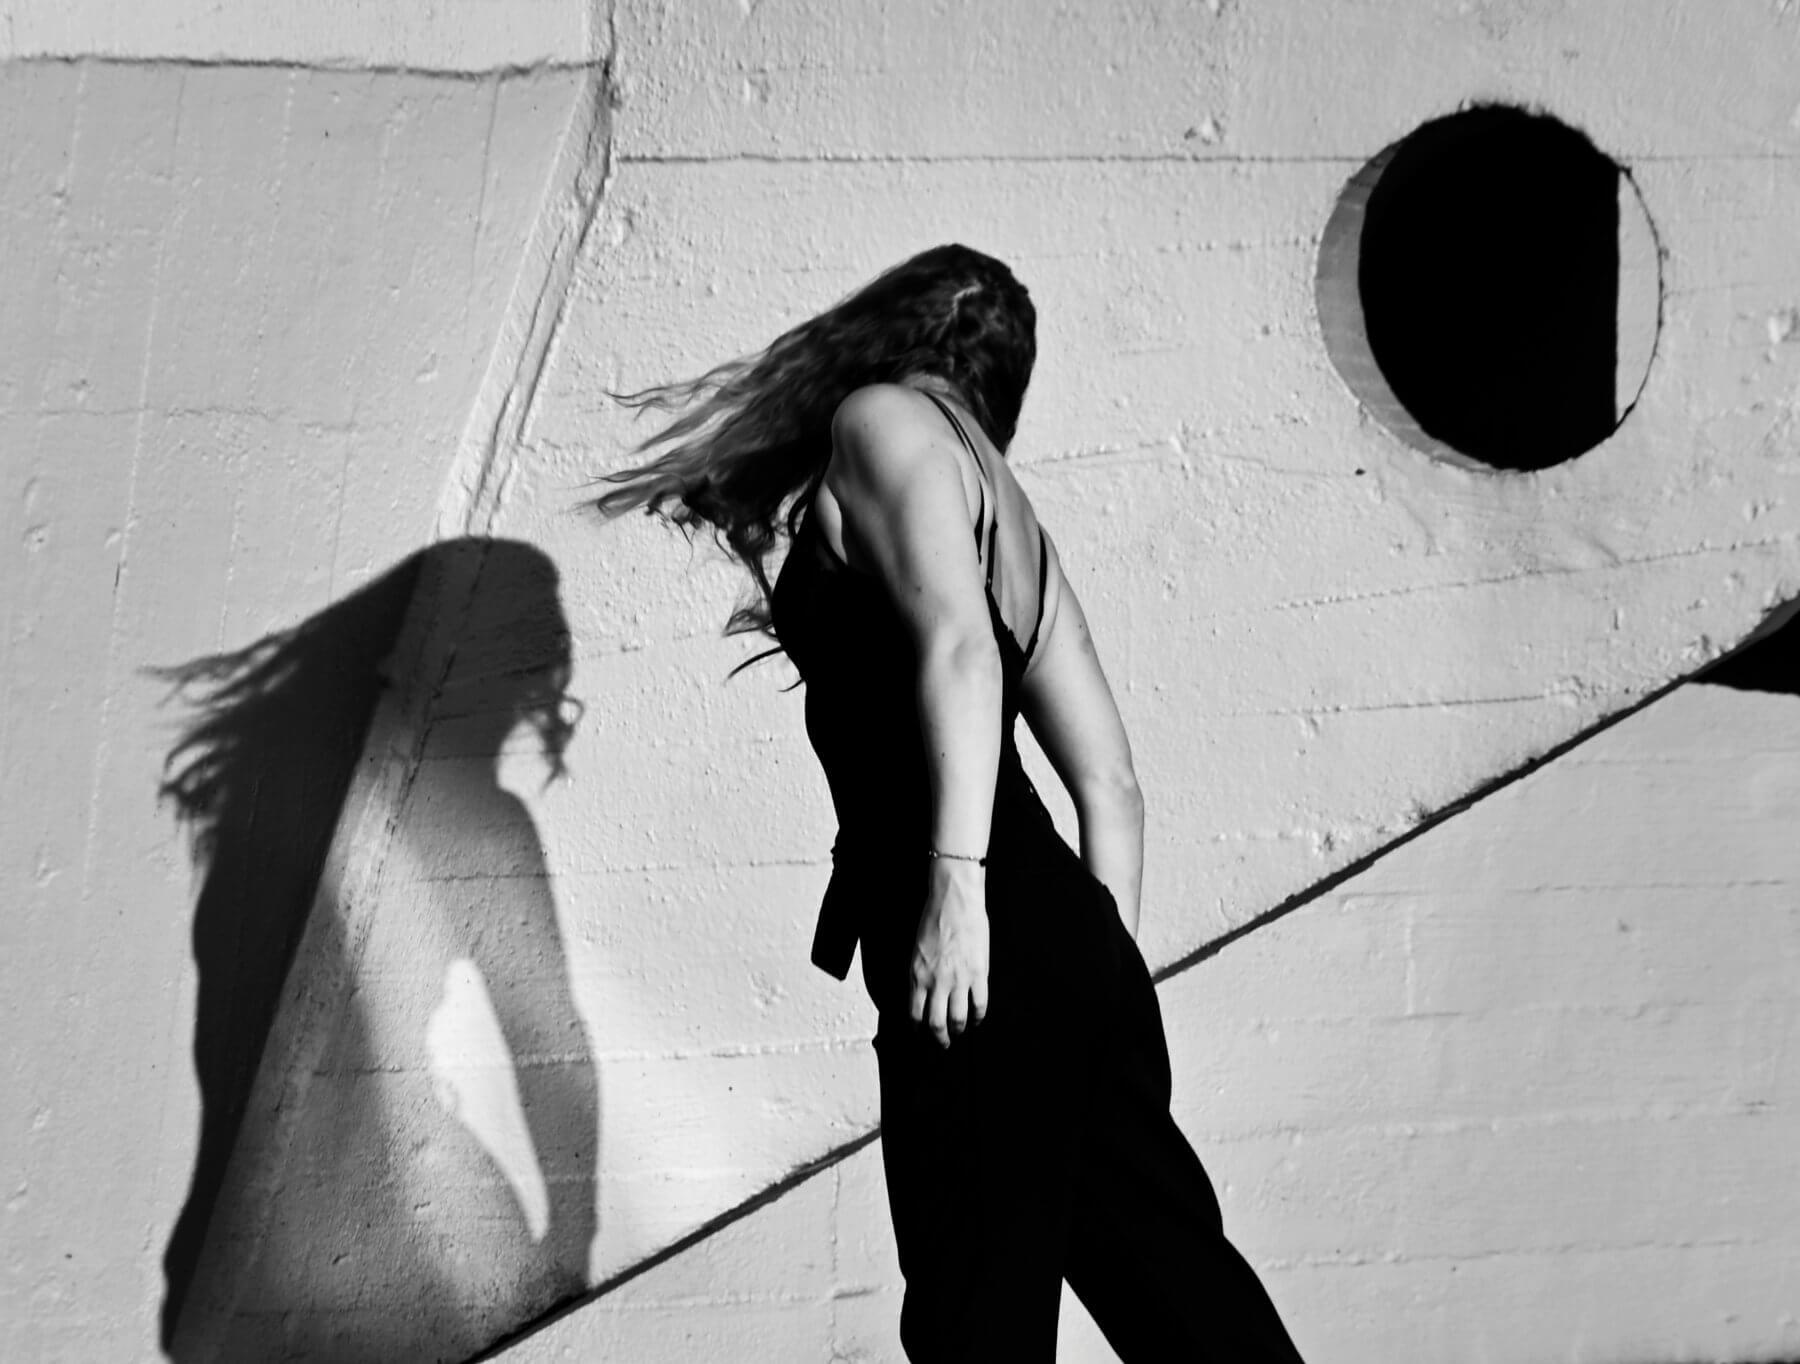 Eckhard Ischebeck - A future dance II